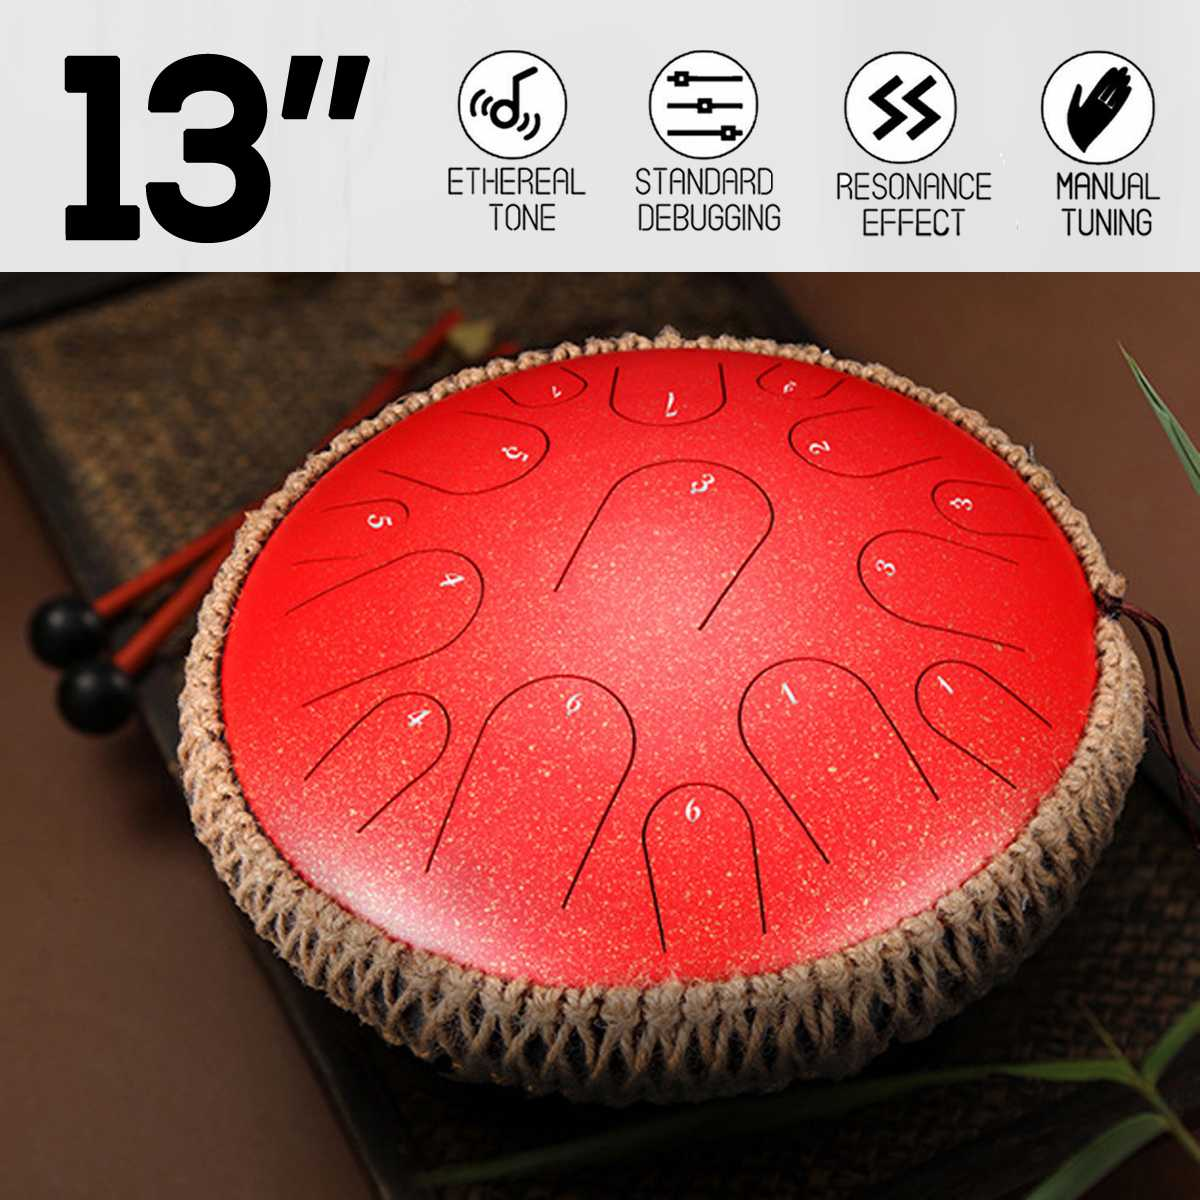 Manual hecho A mano de 13 pulgadas, Mini tambor de percusión de lengua de acero de 15 tonos, instrumento manual con bolsa de transporte, instrumentos musicales